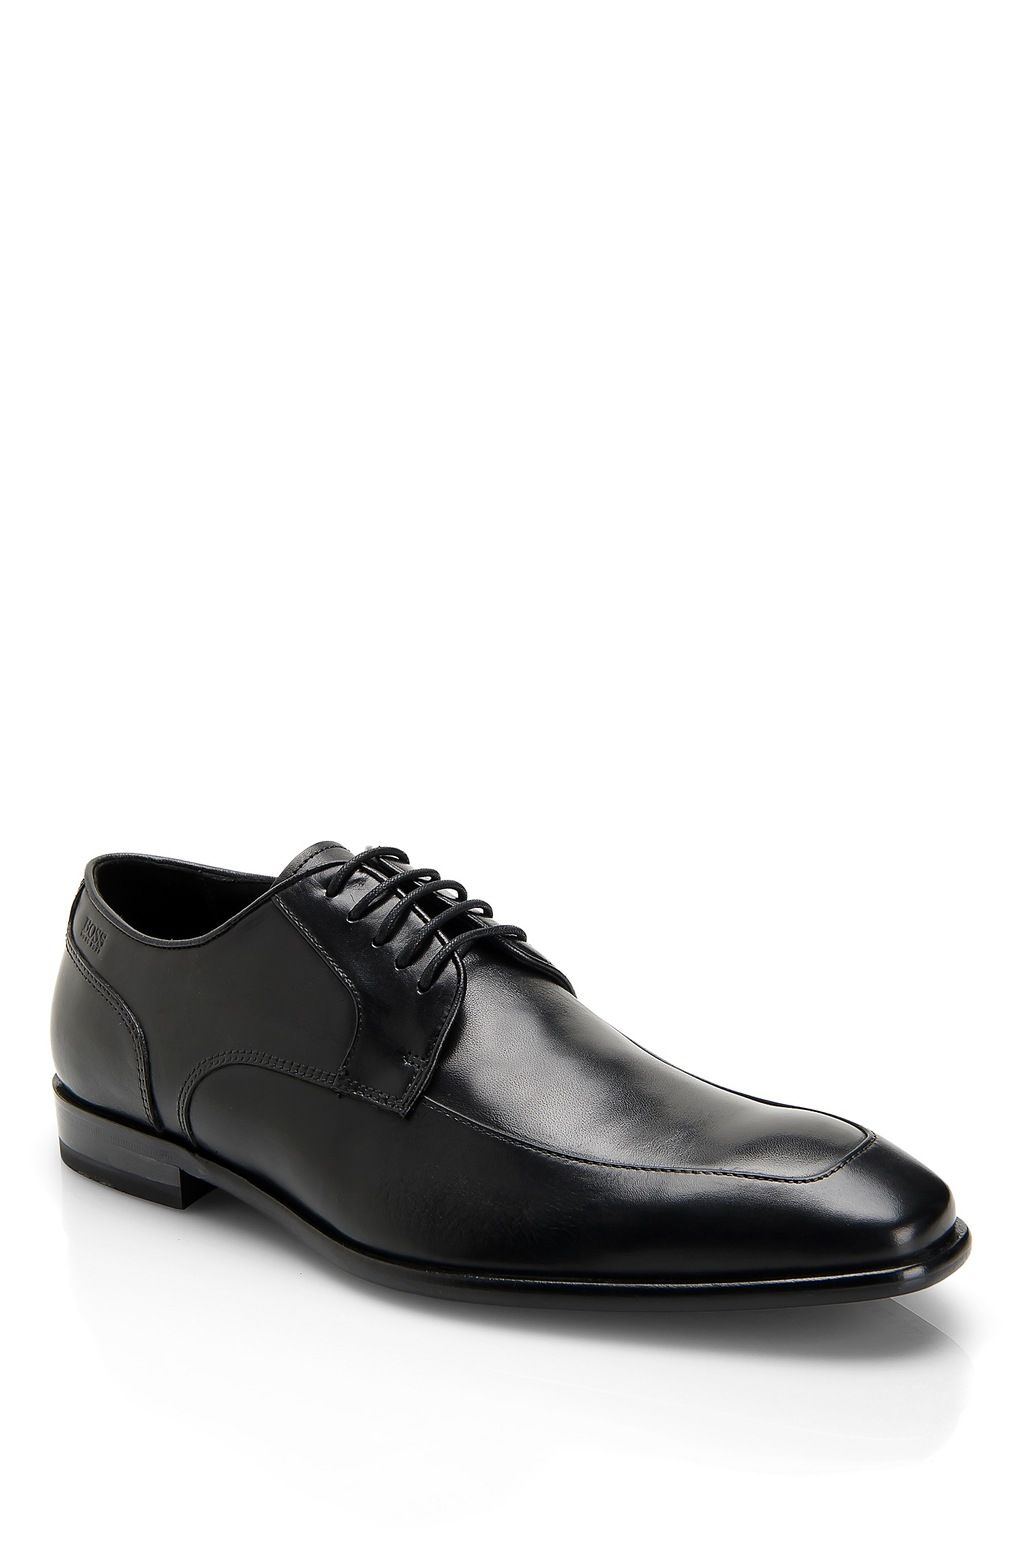 1f4e3d3a4e7 Hugo Boss - 'Mettor' | Leather Lace-Up Dress Shoe. | #Men, #Shoes ...